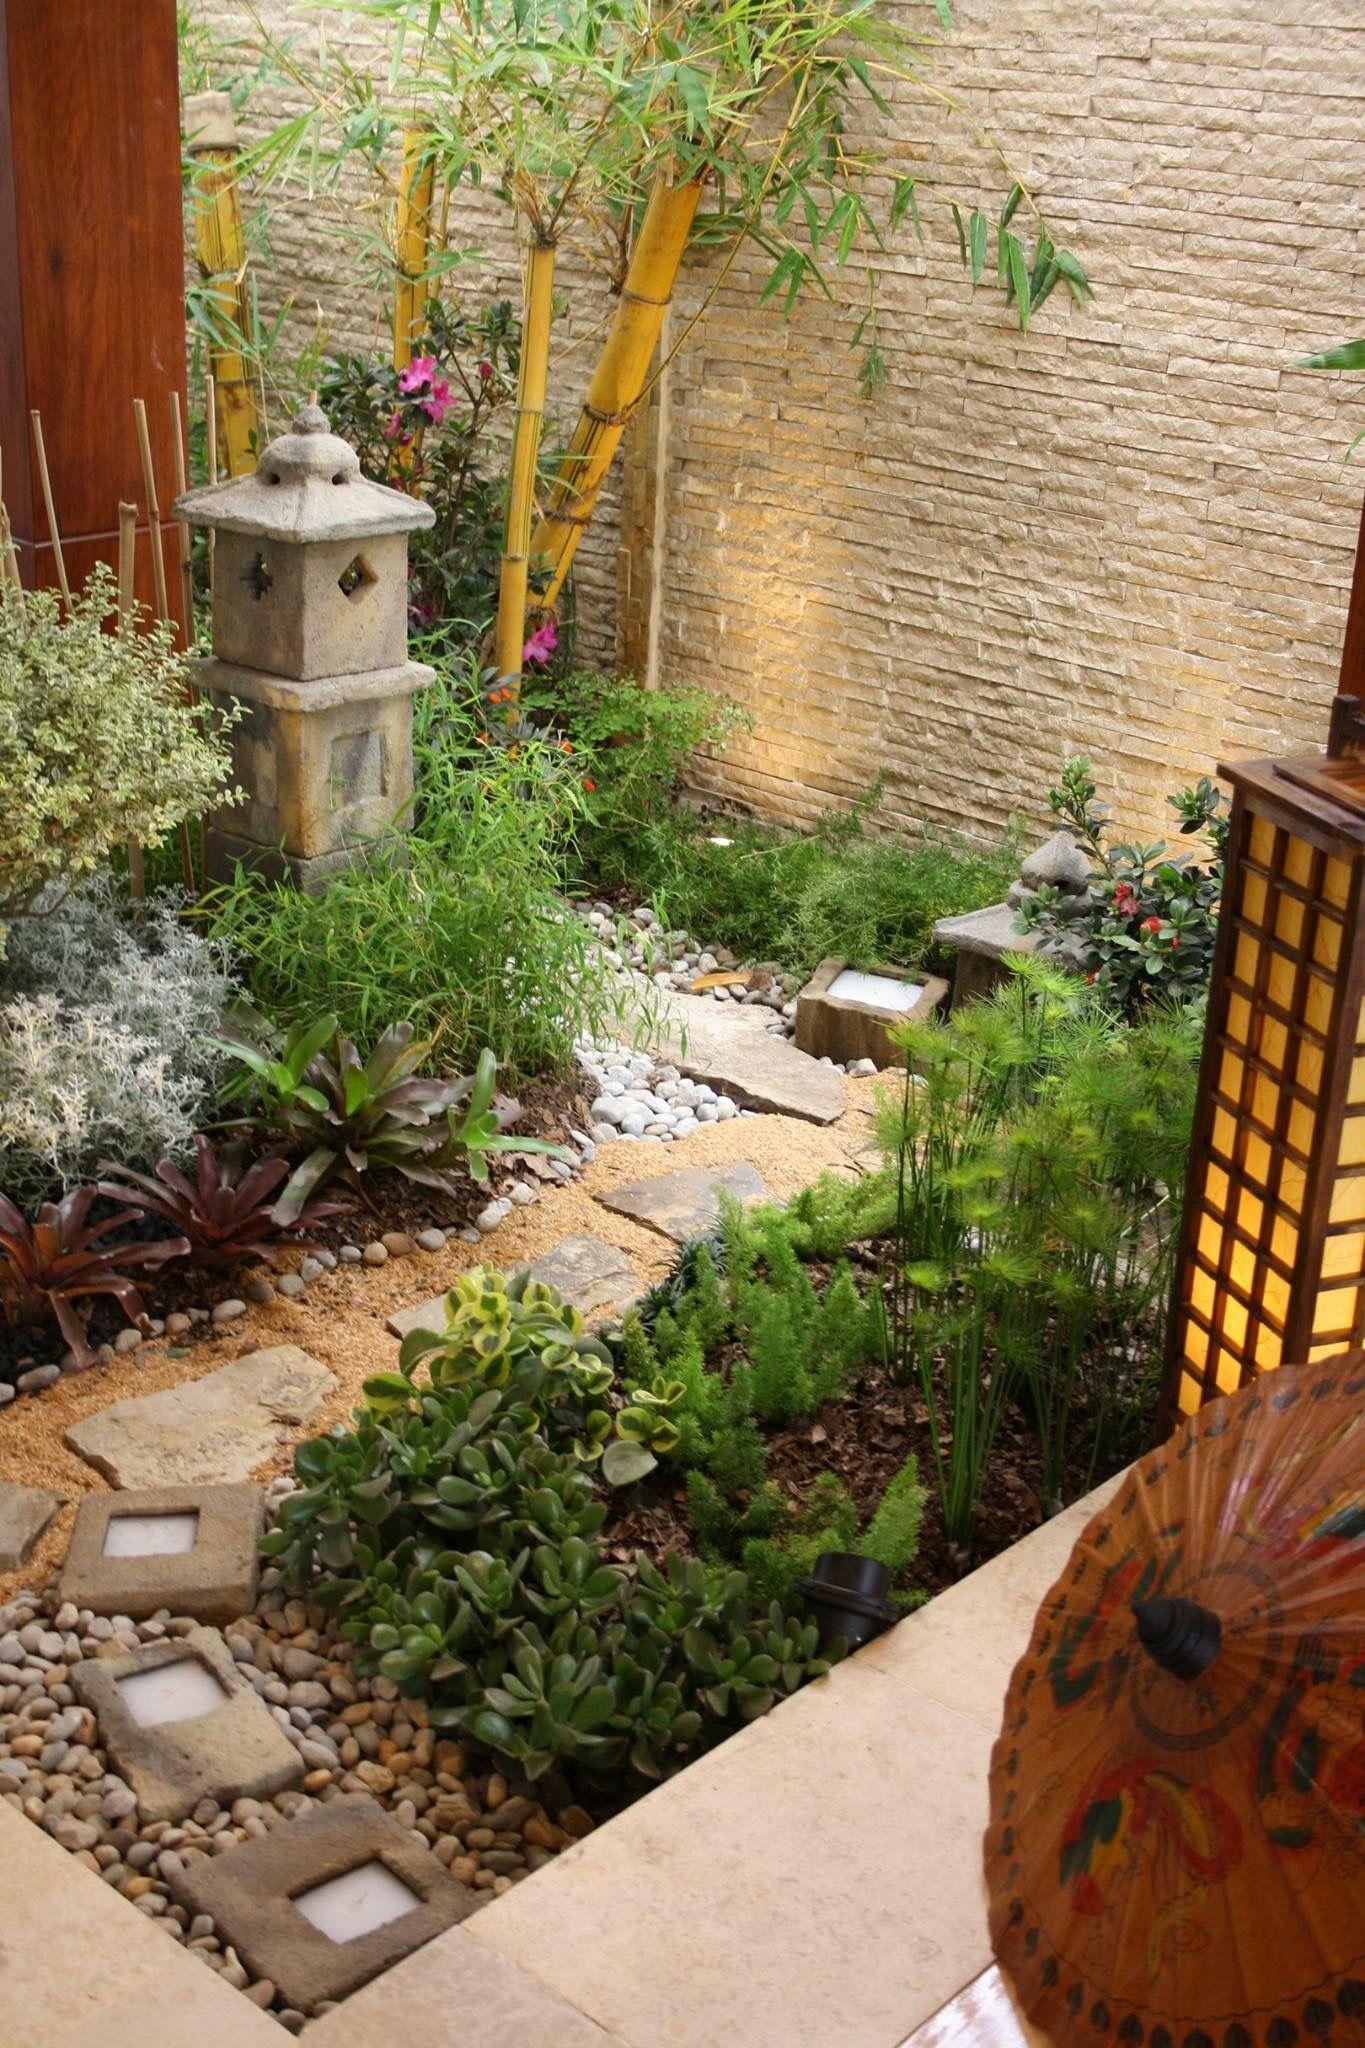 Lindo para jardines peque os jardines peque os for Jardines interiores pequenos minimalistas